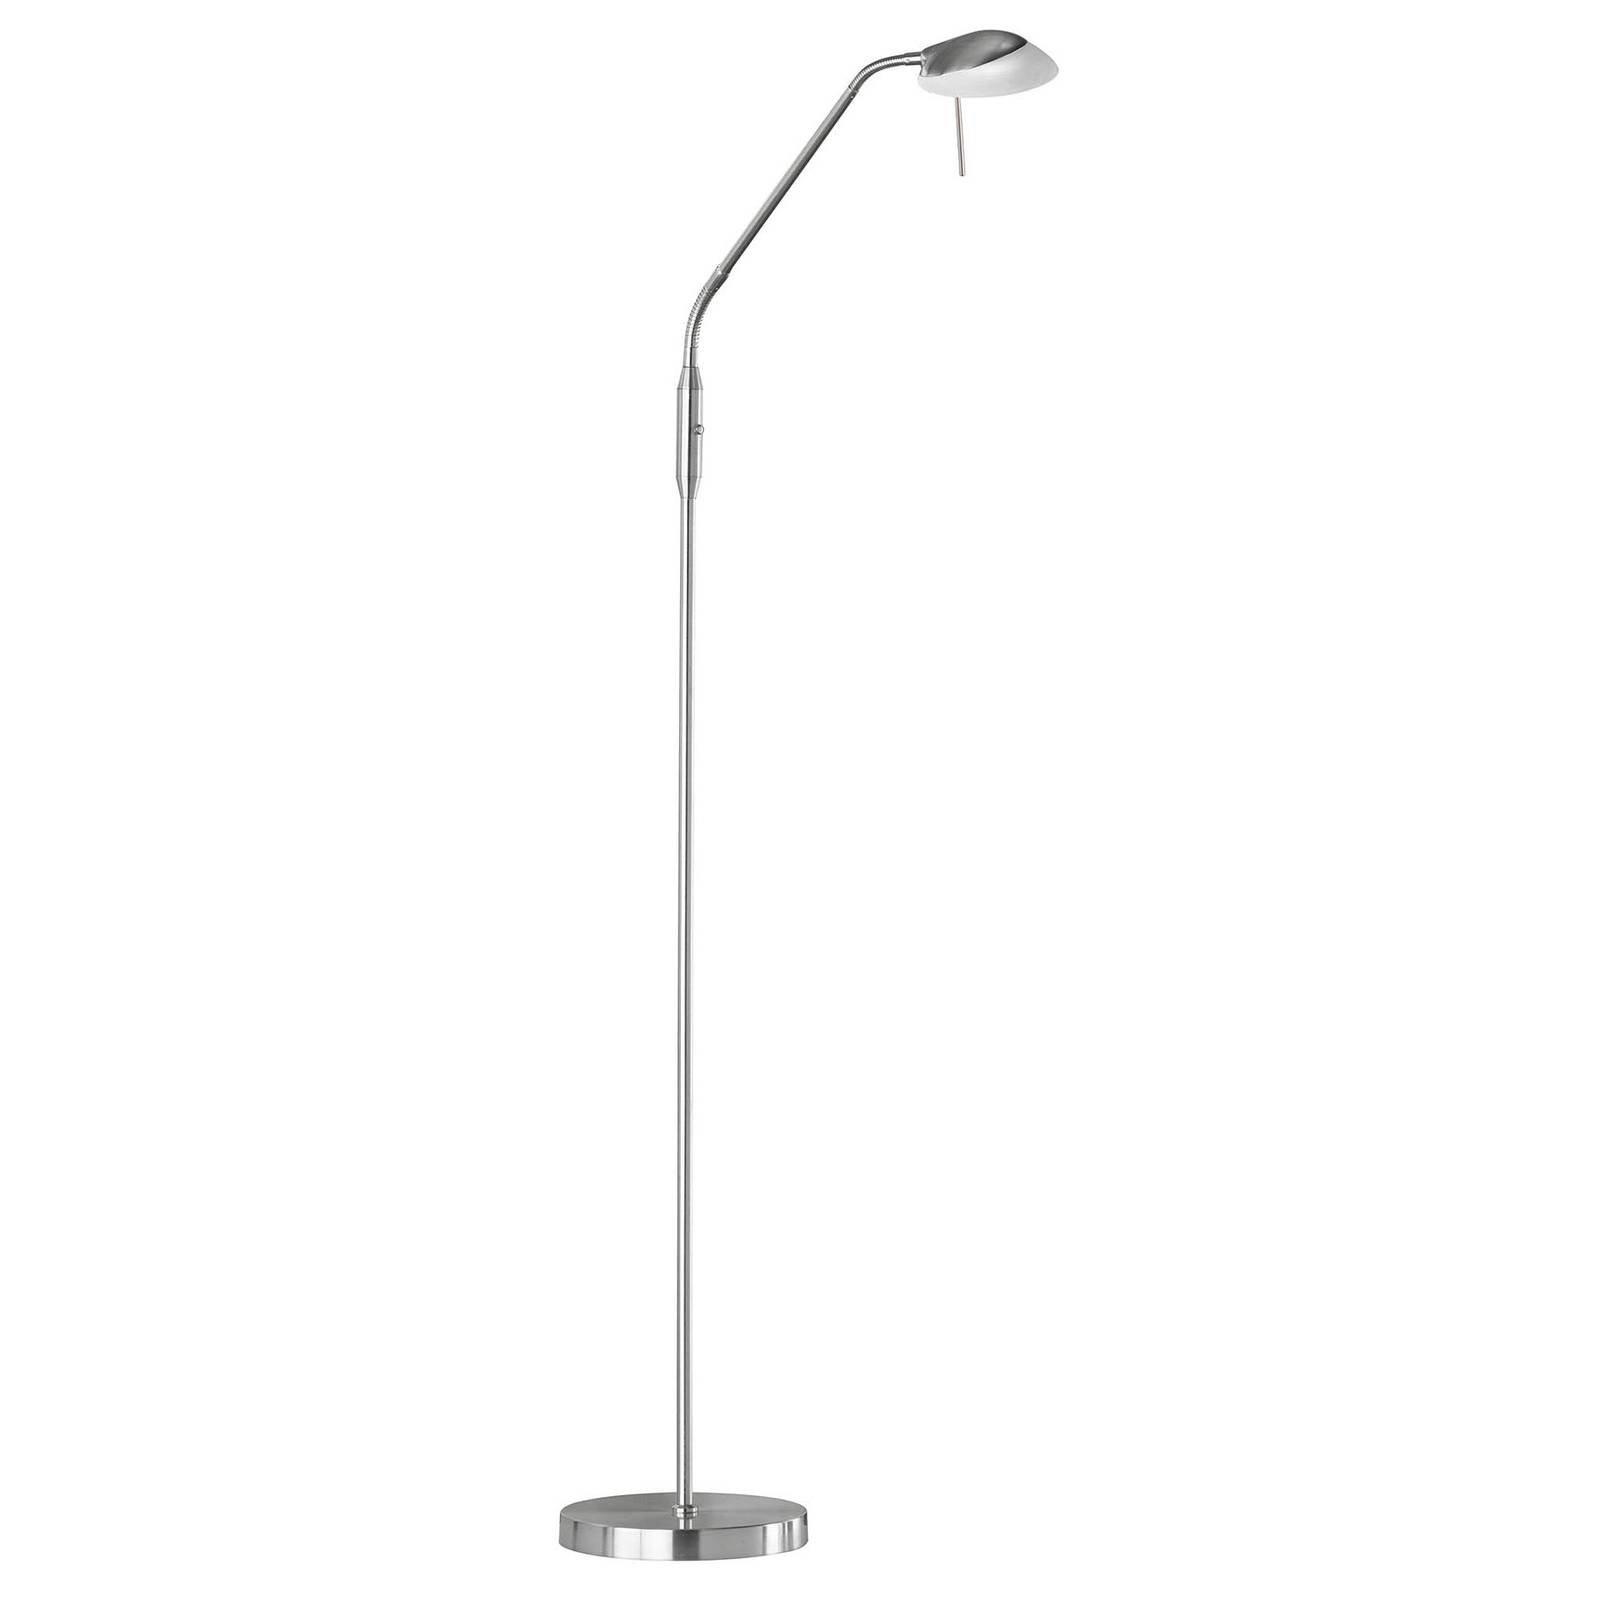 LED-gulvlampe Pool TW, 1 lyskilde, nikkel